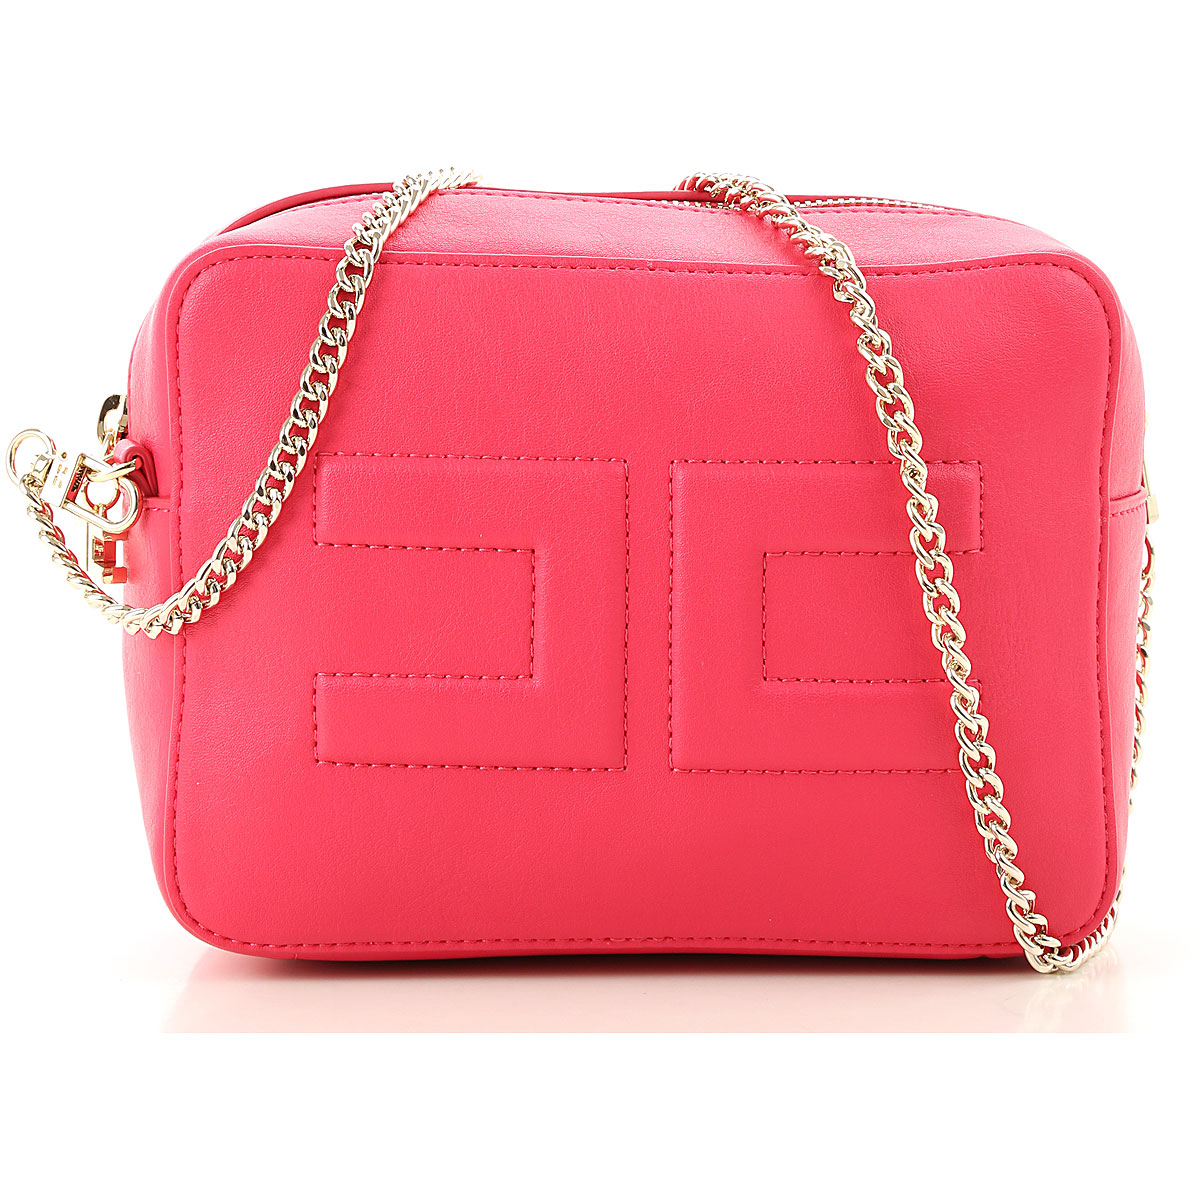 Elisabetta Franchi Girls Handbag On Sale, Fuchsia, polyurethane, 2019